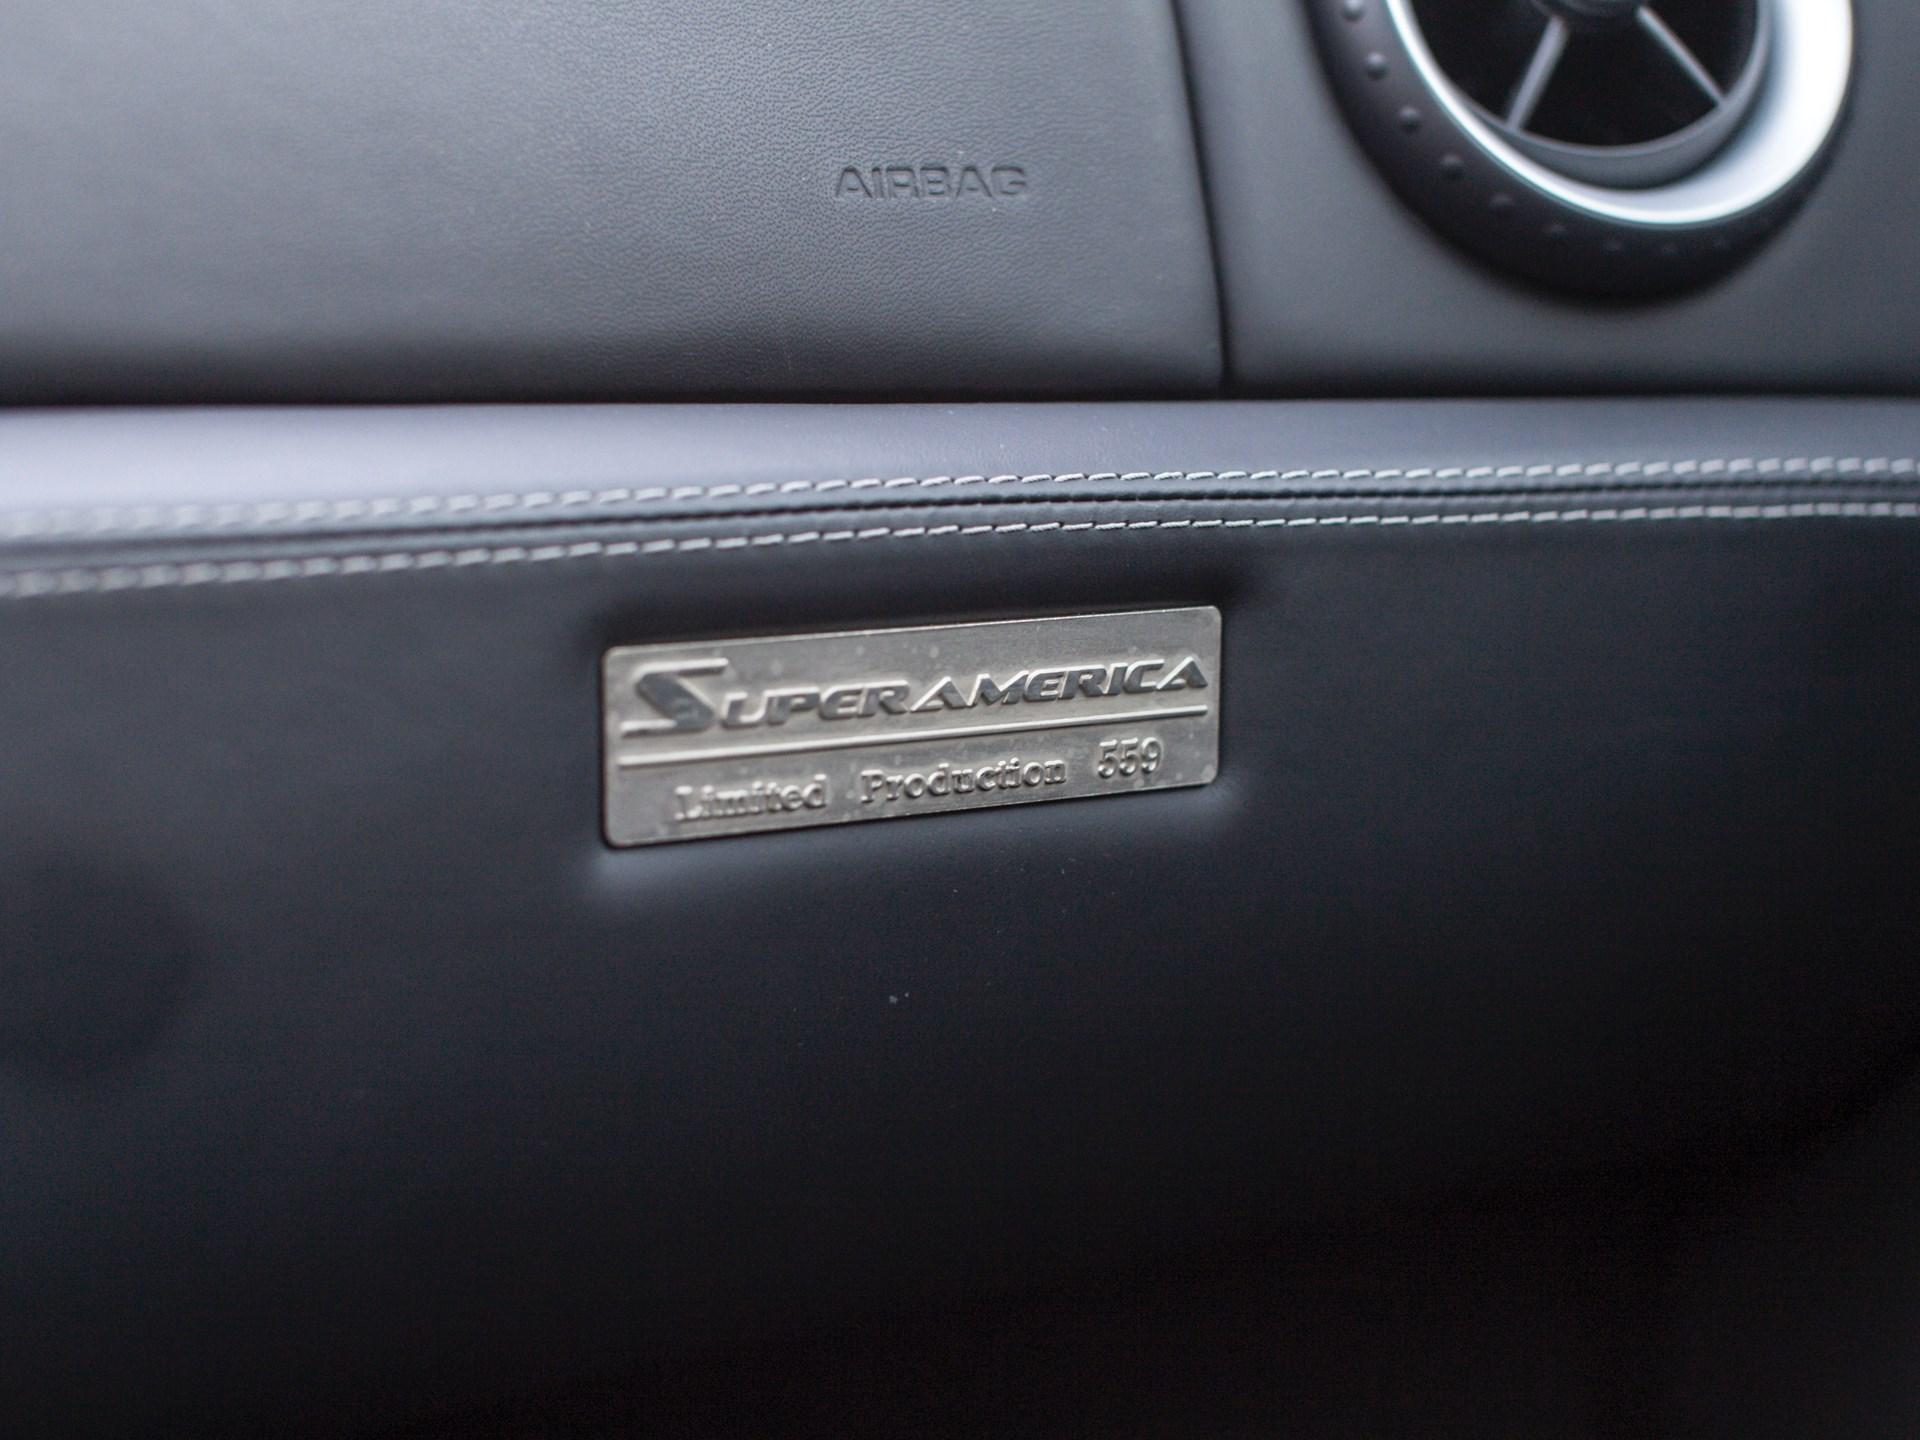 2006 Ferrari Superamerica